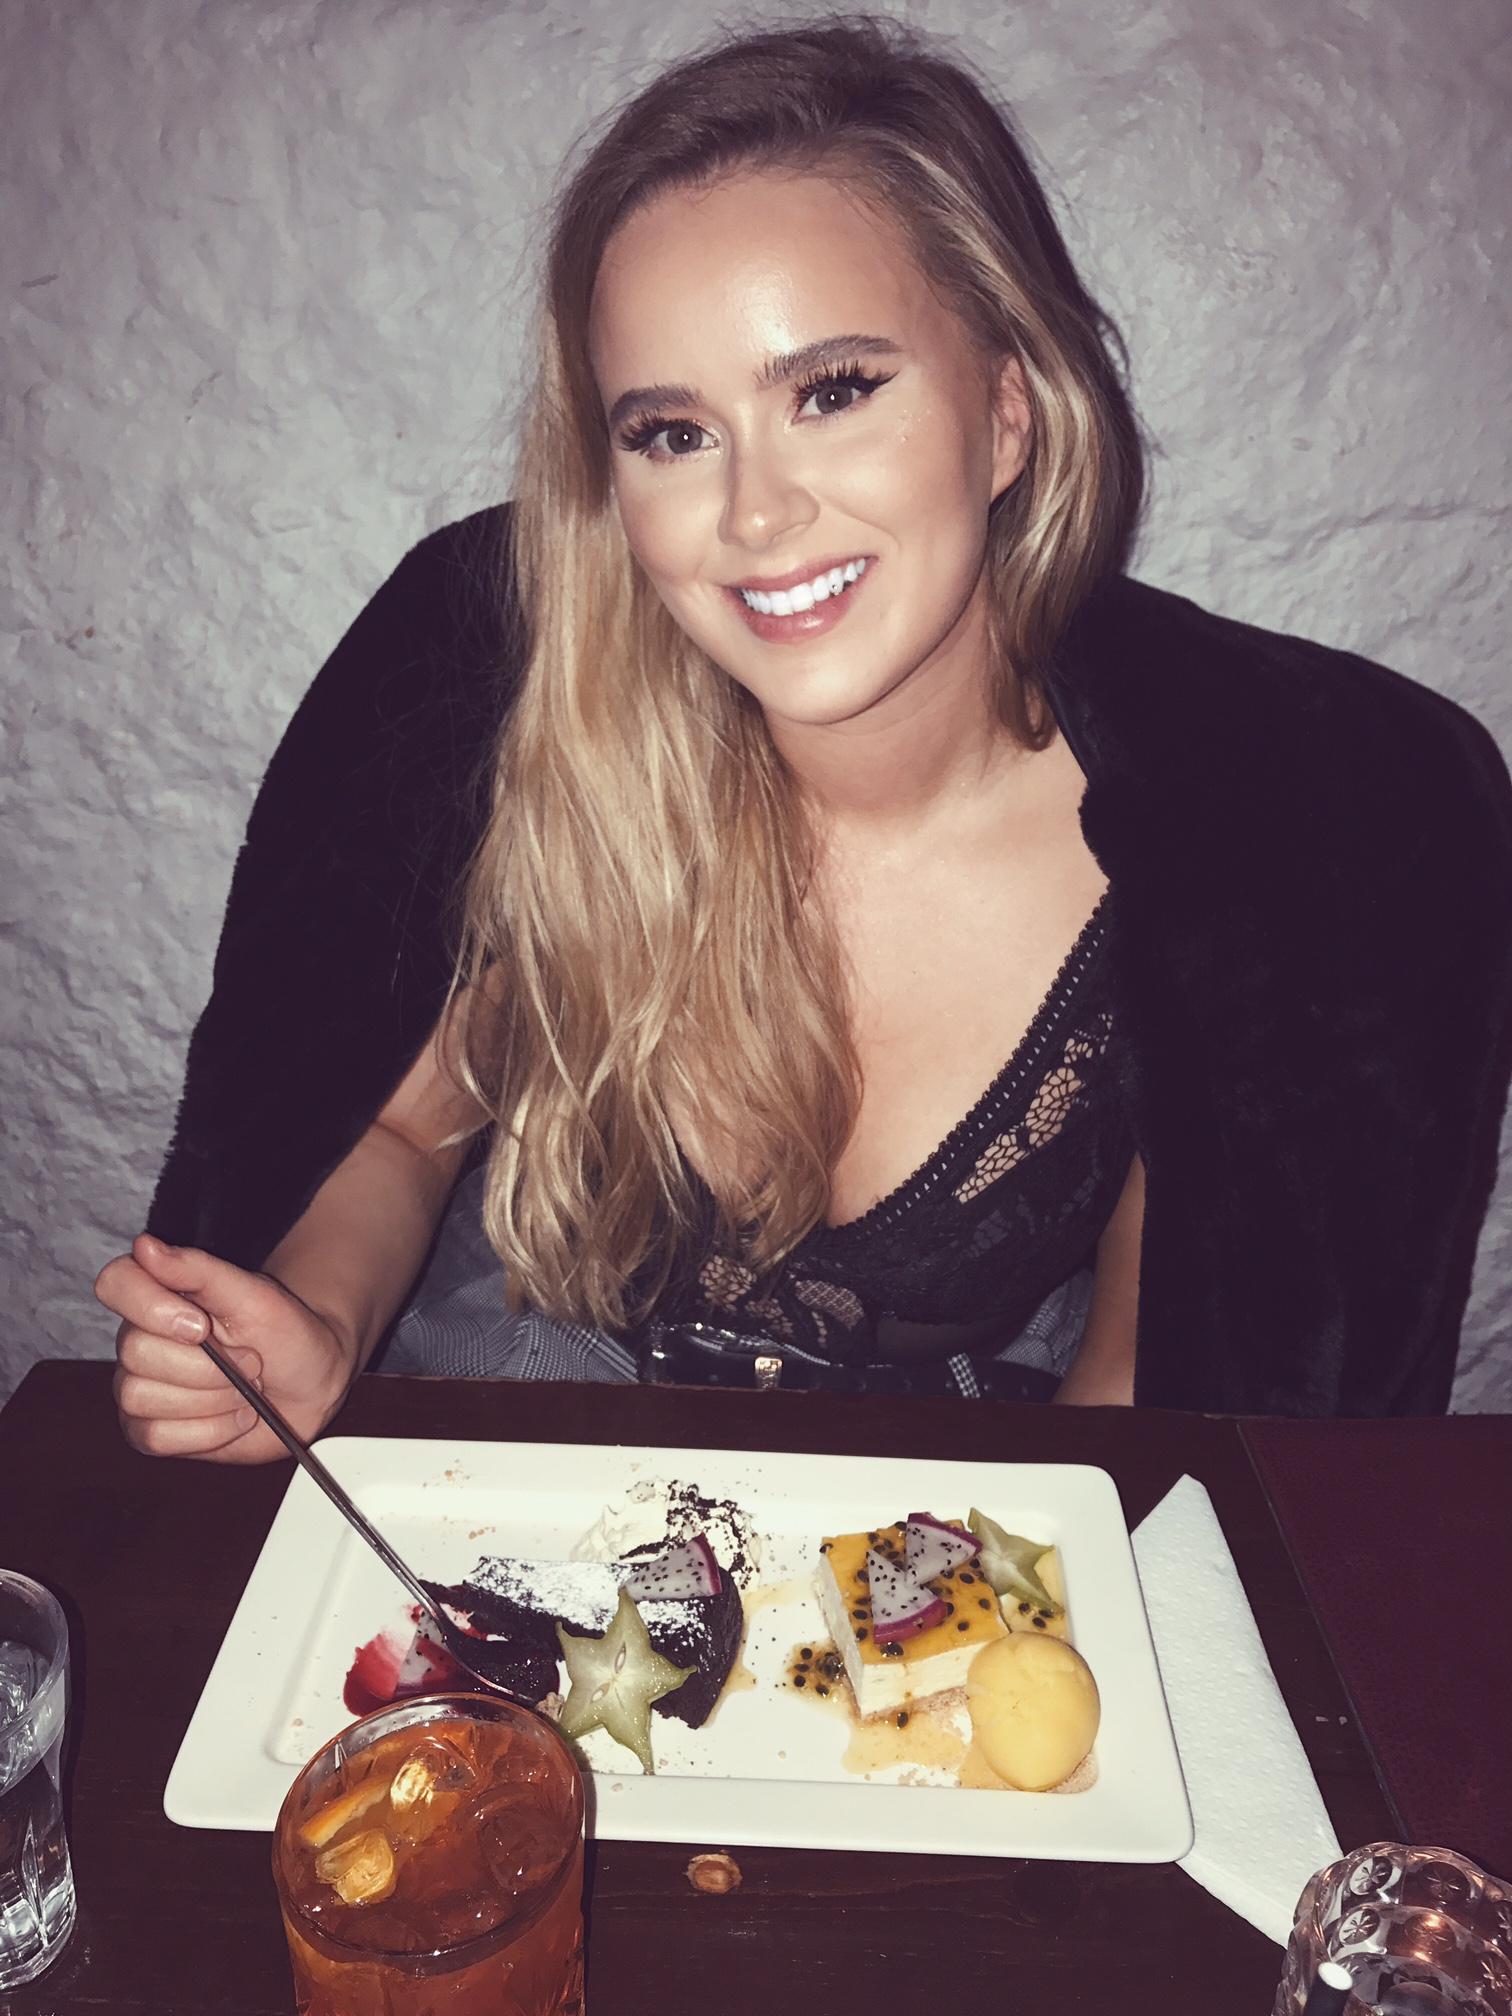 LATE NIGHT DINING